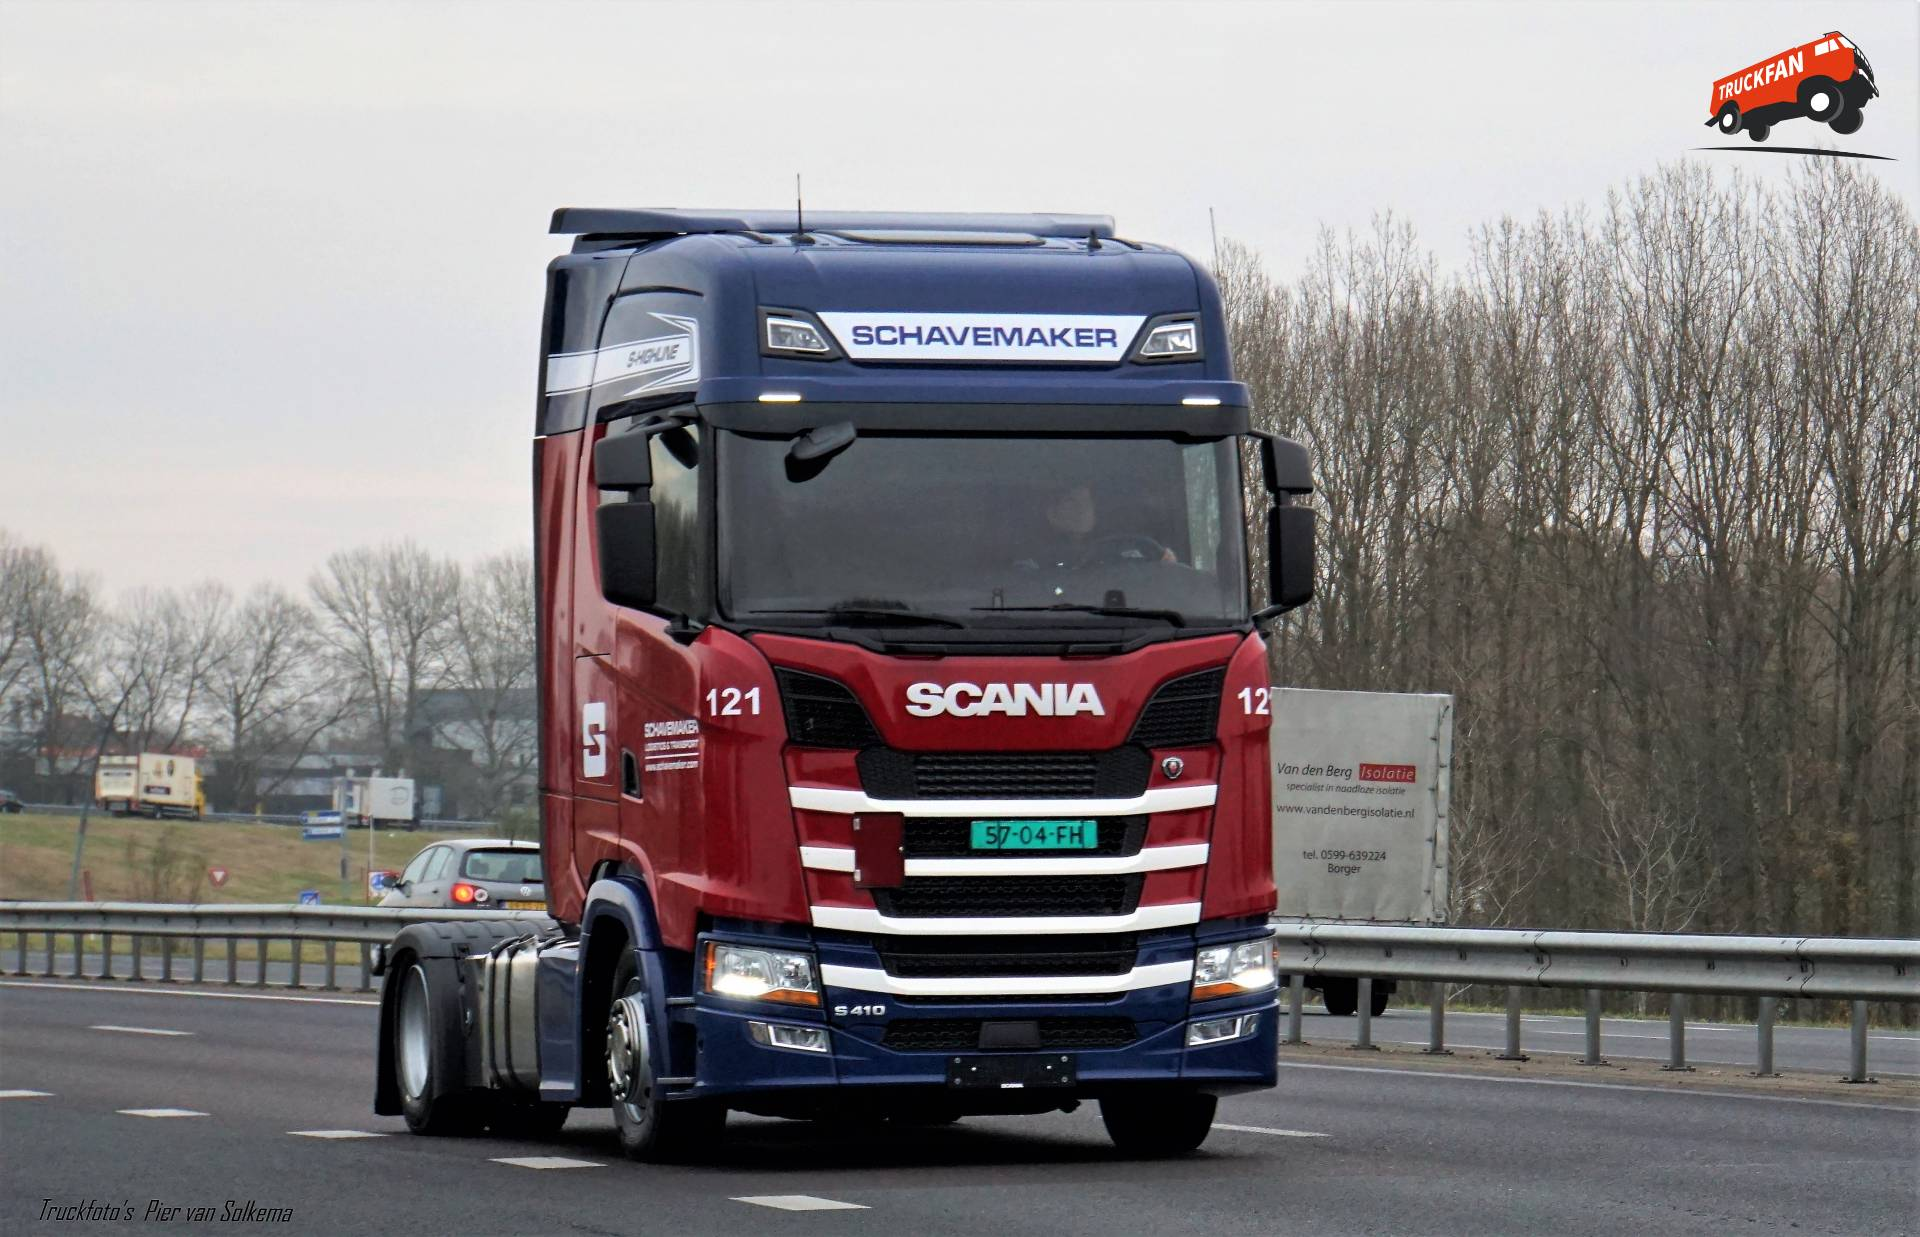 Scania S410